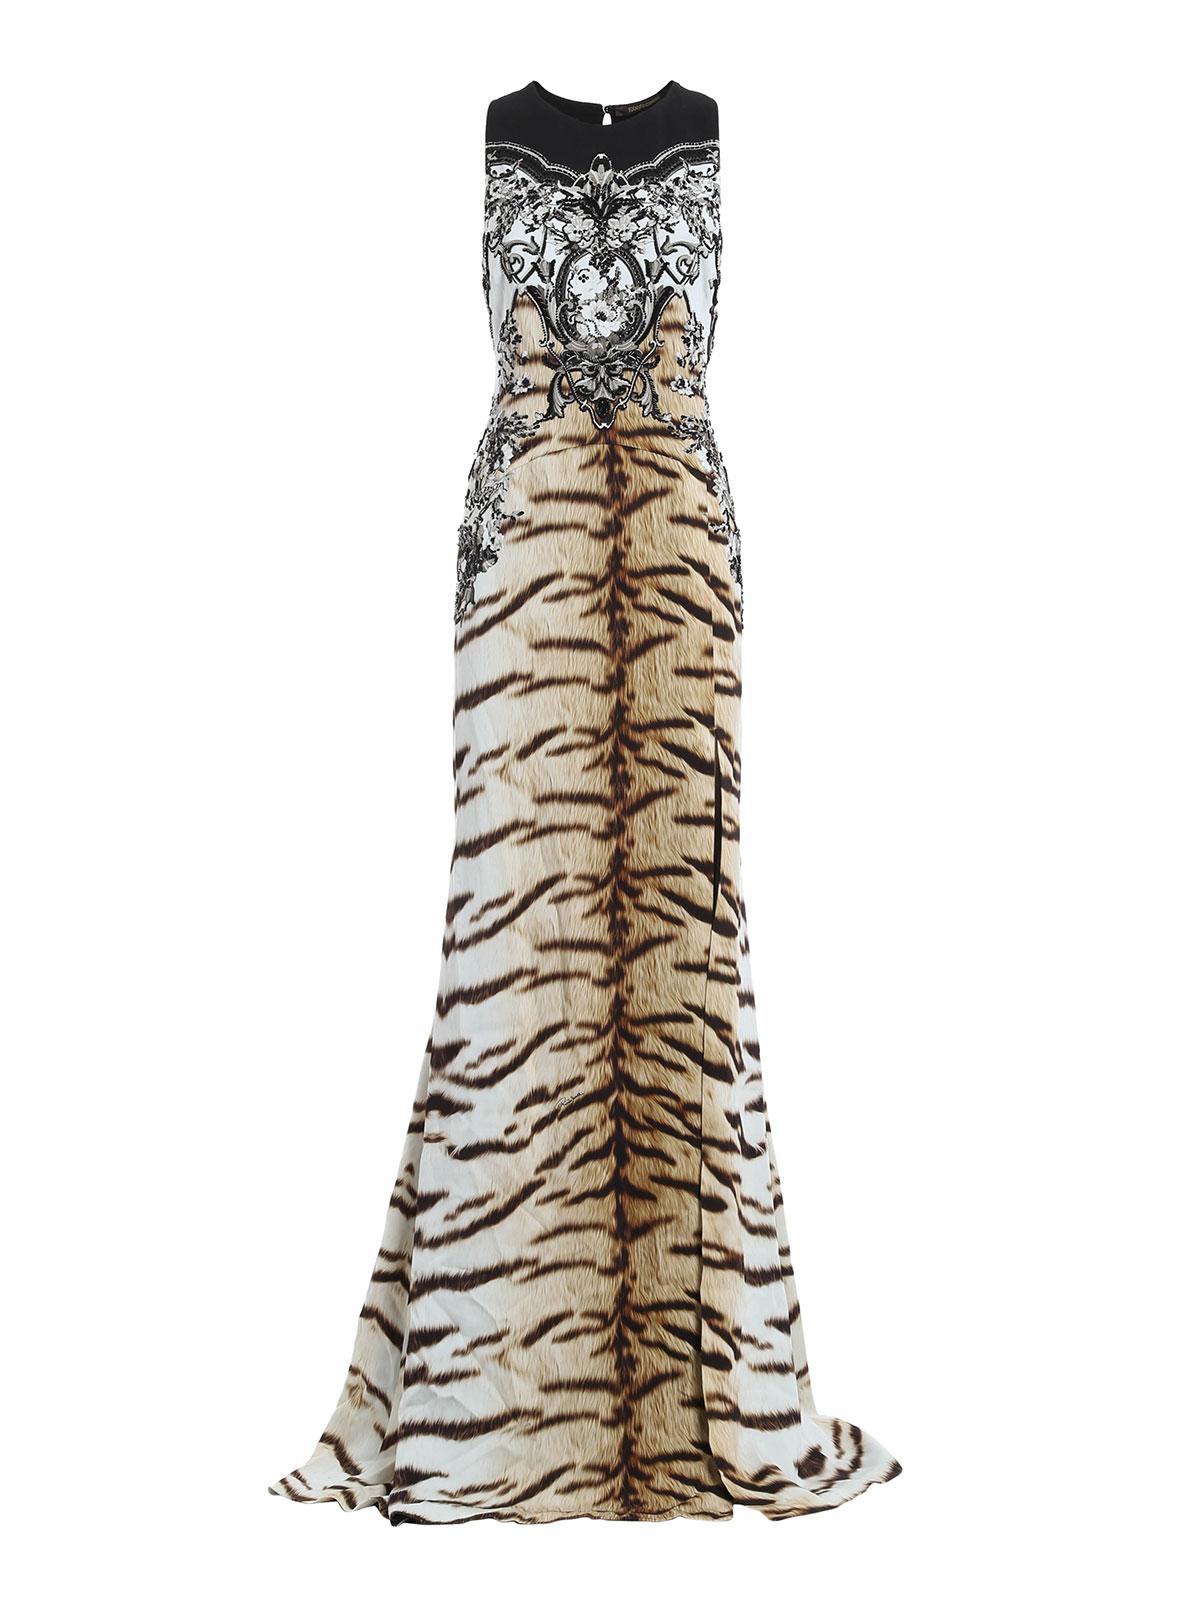 Abiti Da Sera Just Cavalli.Roberto Cavalli Fantasy Print Maxi Dress Evening Dresses